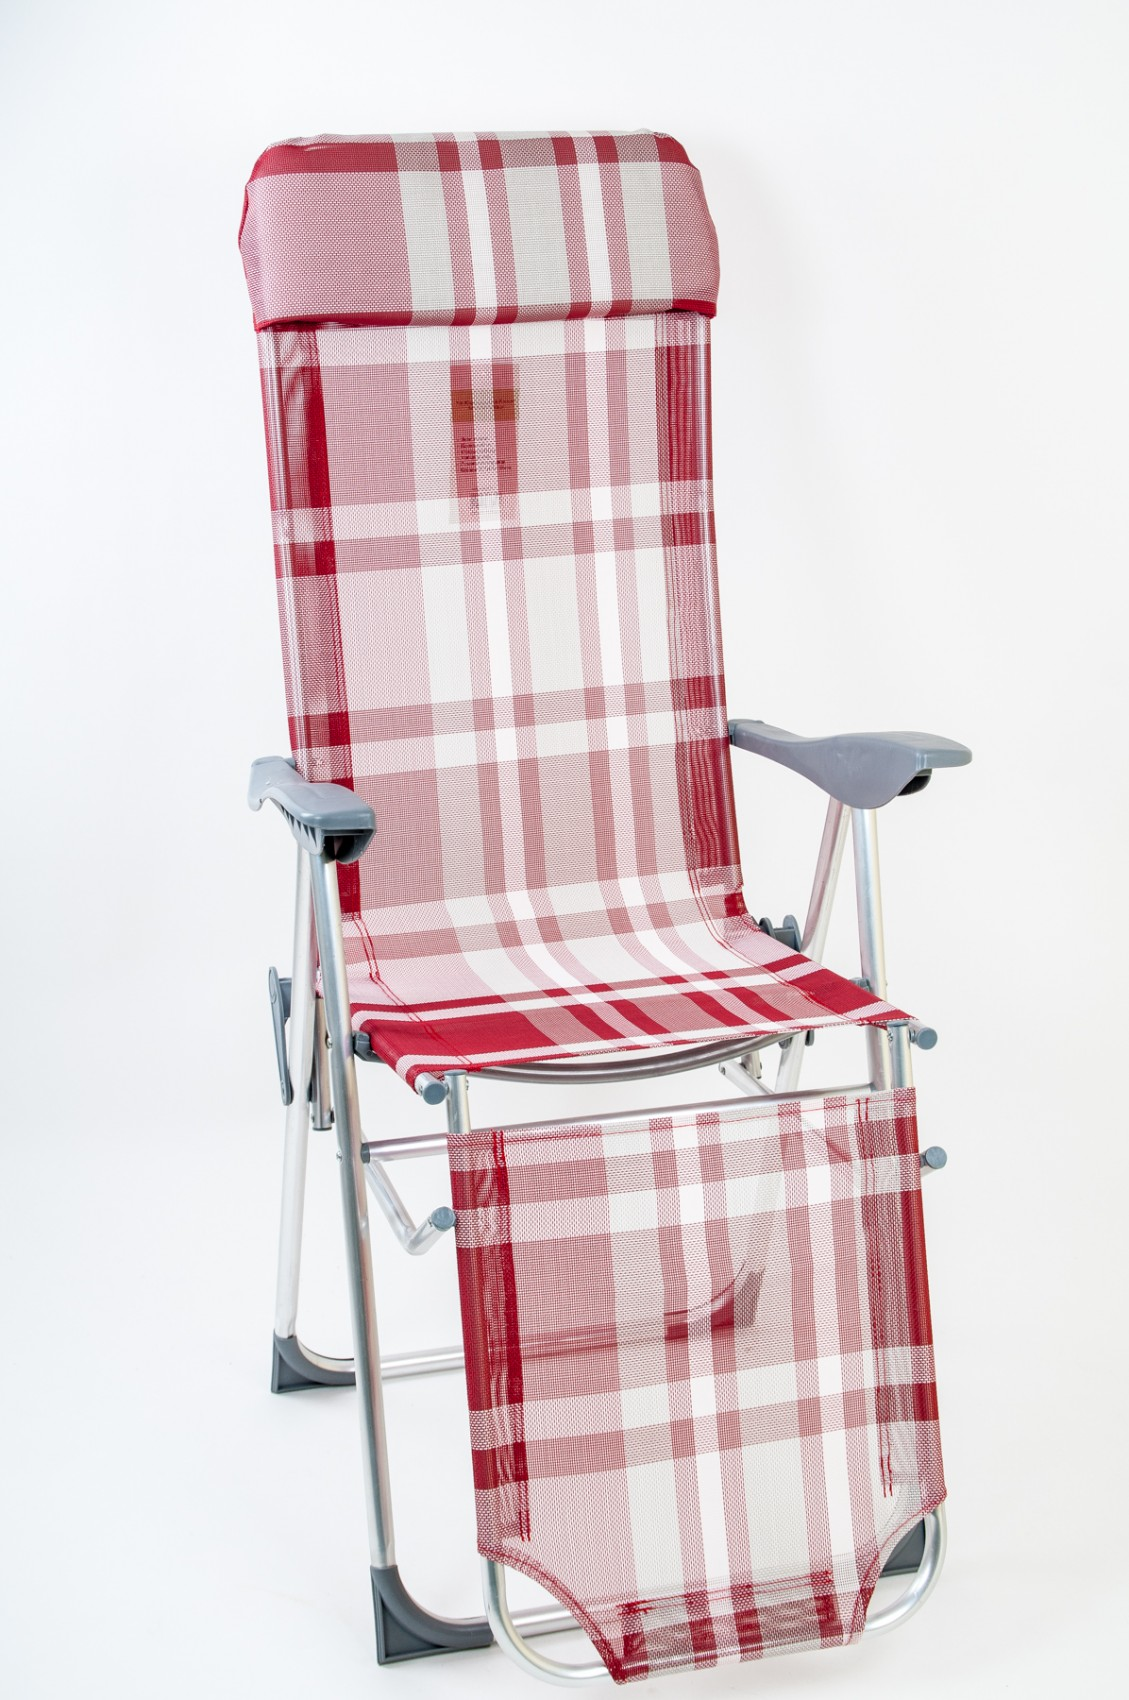 alu klappsessel 5 fach verstellbar gartenliege klappstuhl campingliege alustuhl ebay. Black Bedroom Furniture Sets. Home Design Ideas